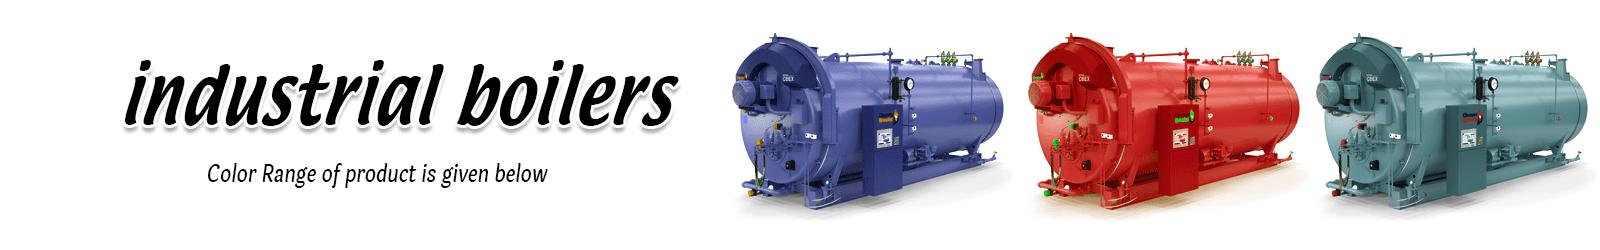 industrial boilers-min